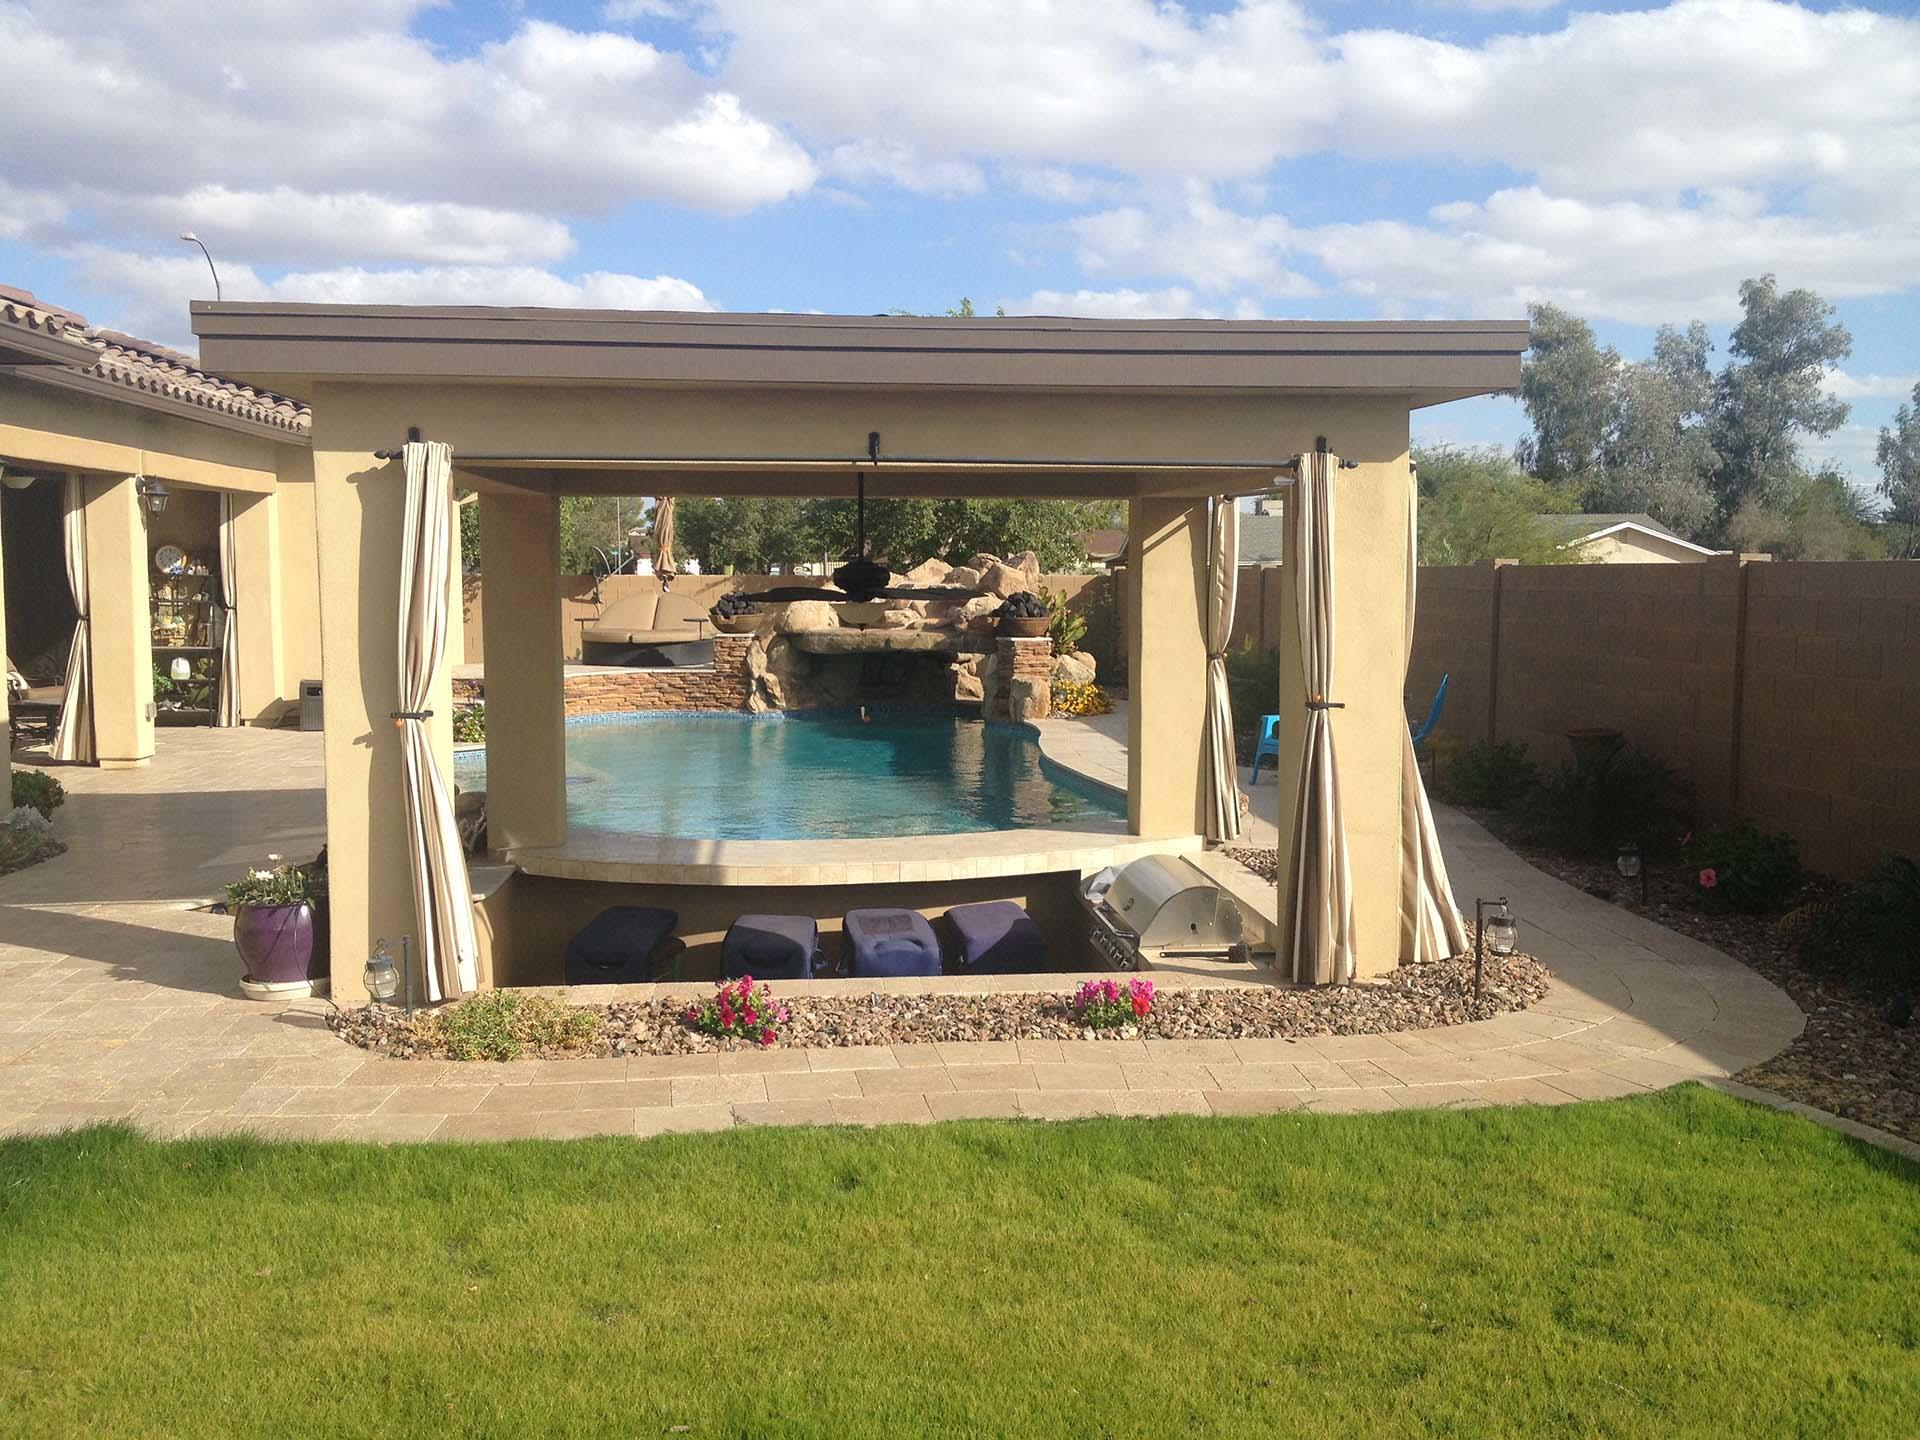 No Limit Pools & Spas image 44